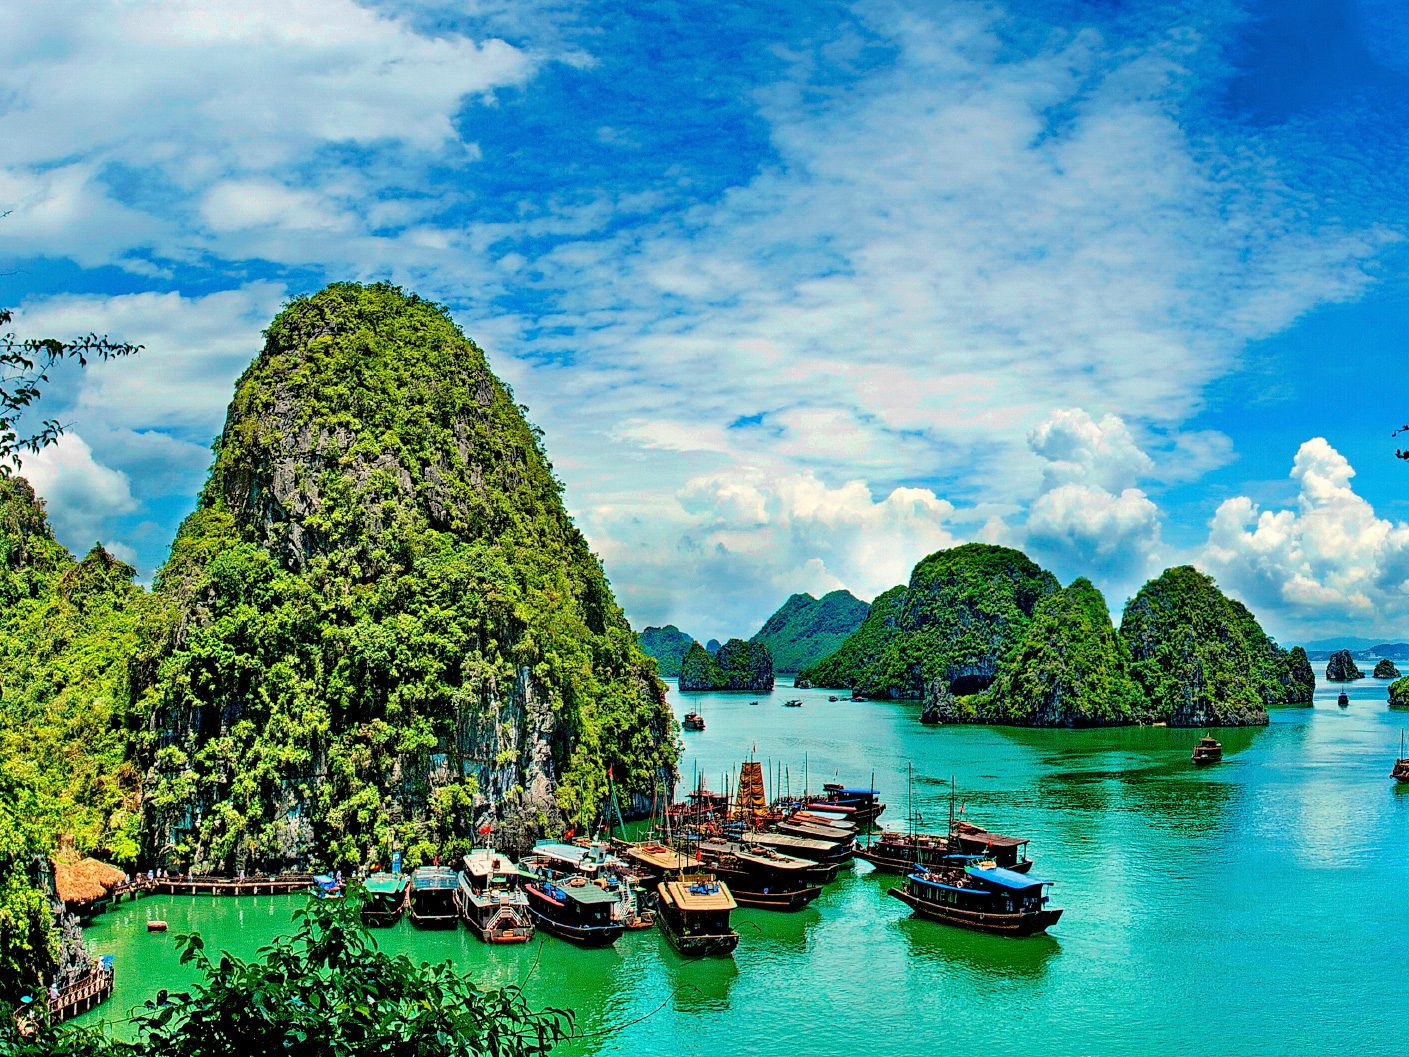 Visit: Hạ Long Bay, Vietnam